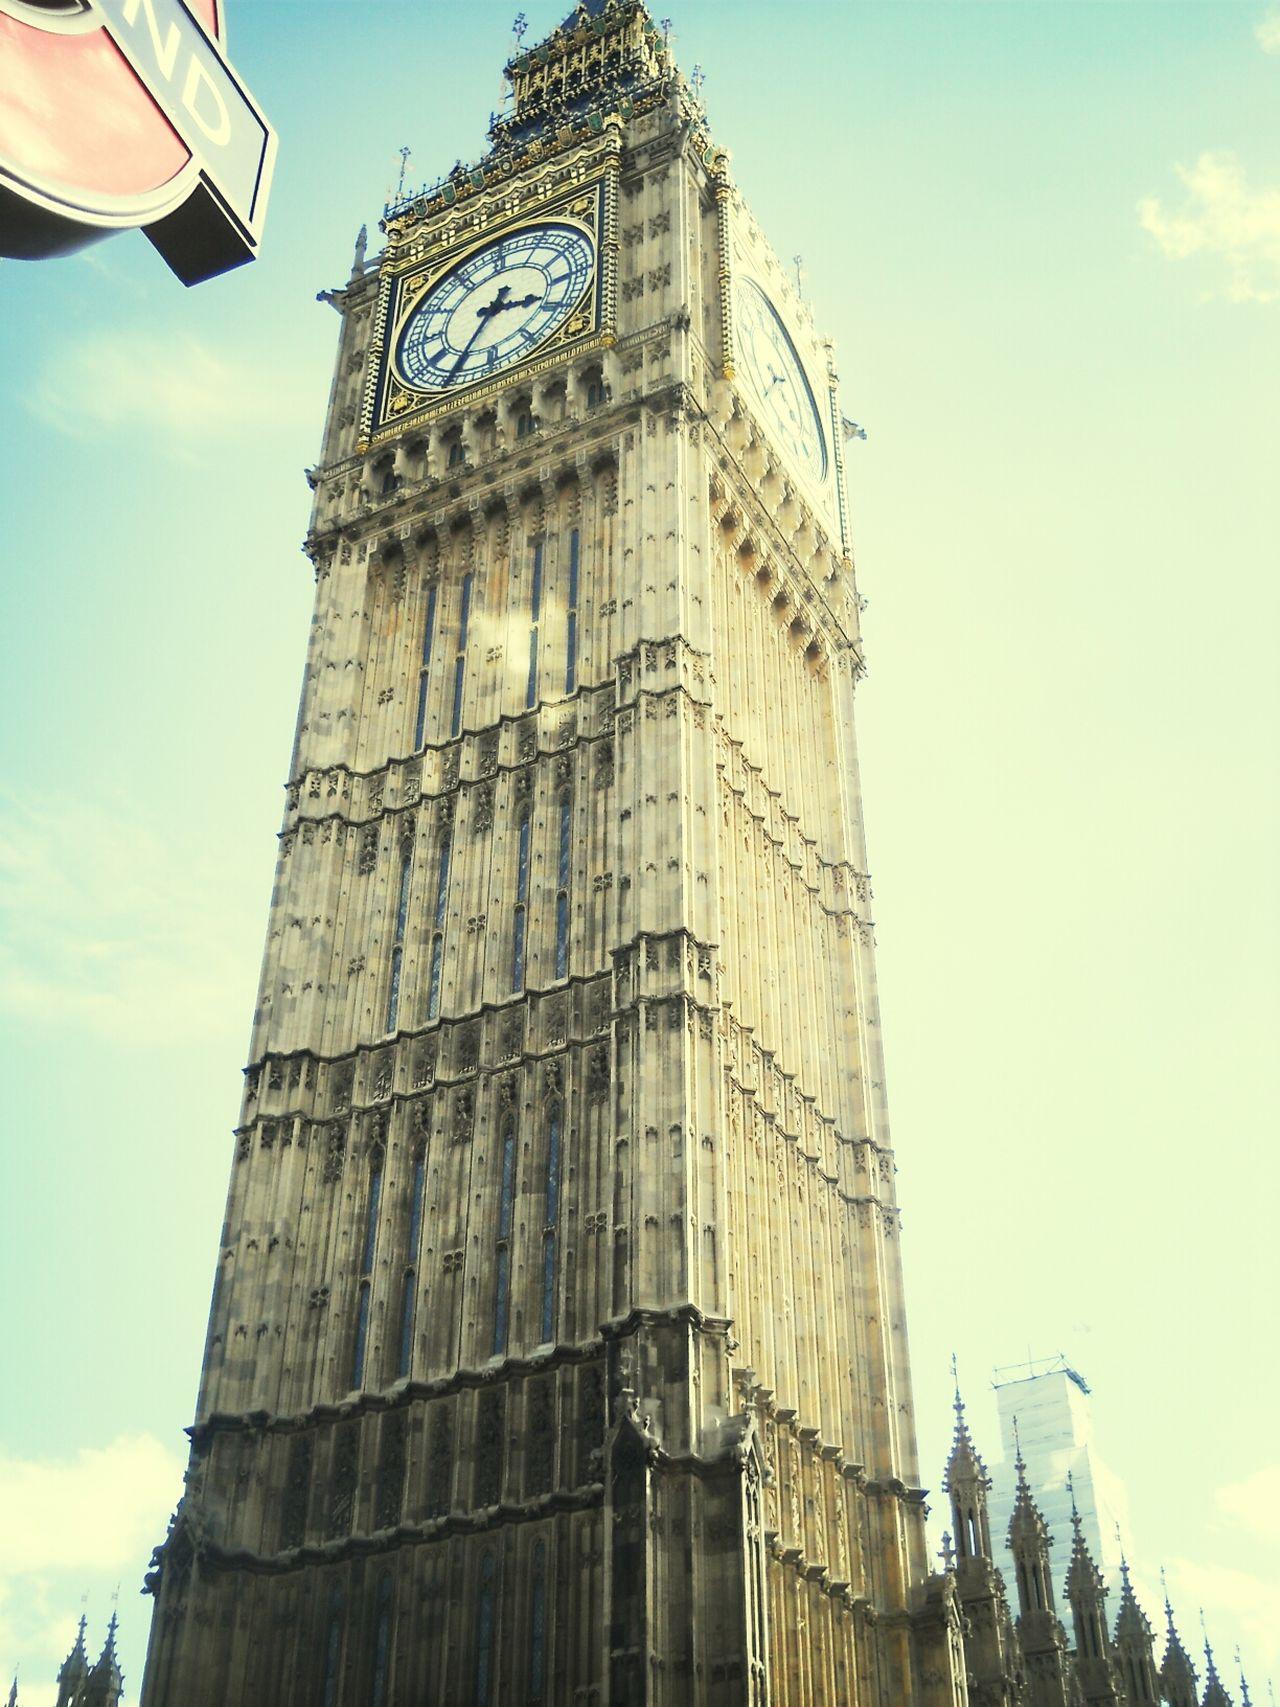 Taking Photos Travel The Environmentalist – 2014 EyeEm Awards Londres